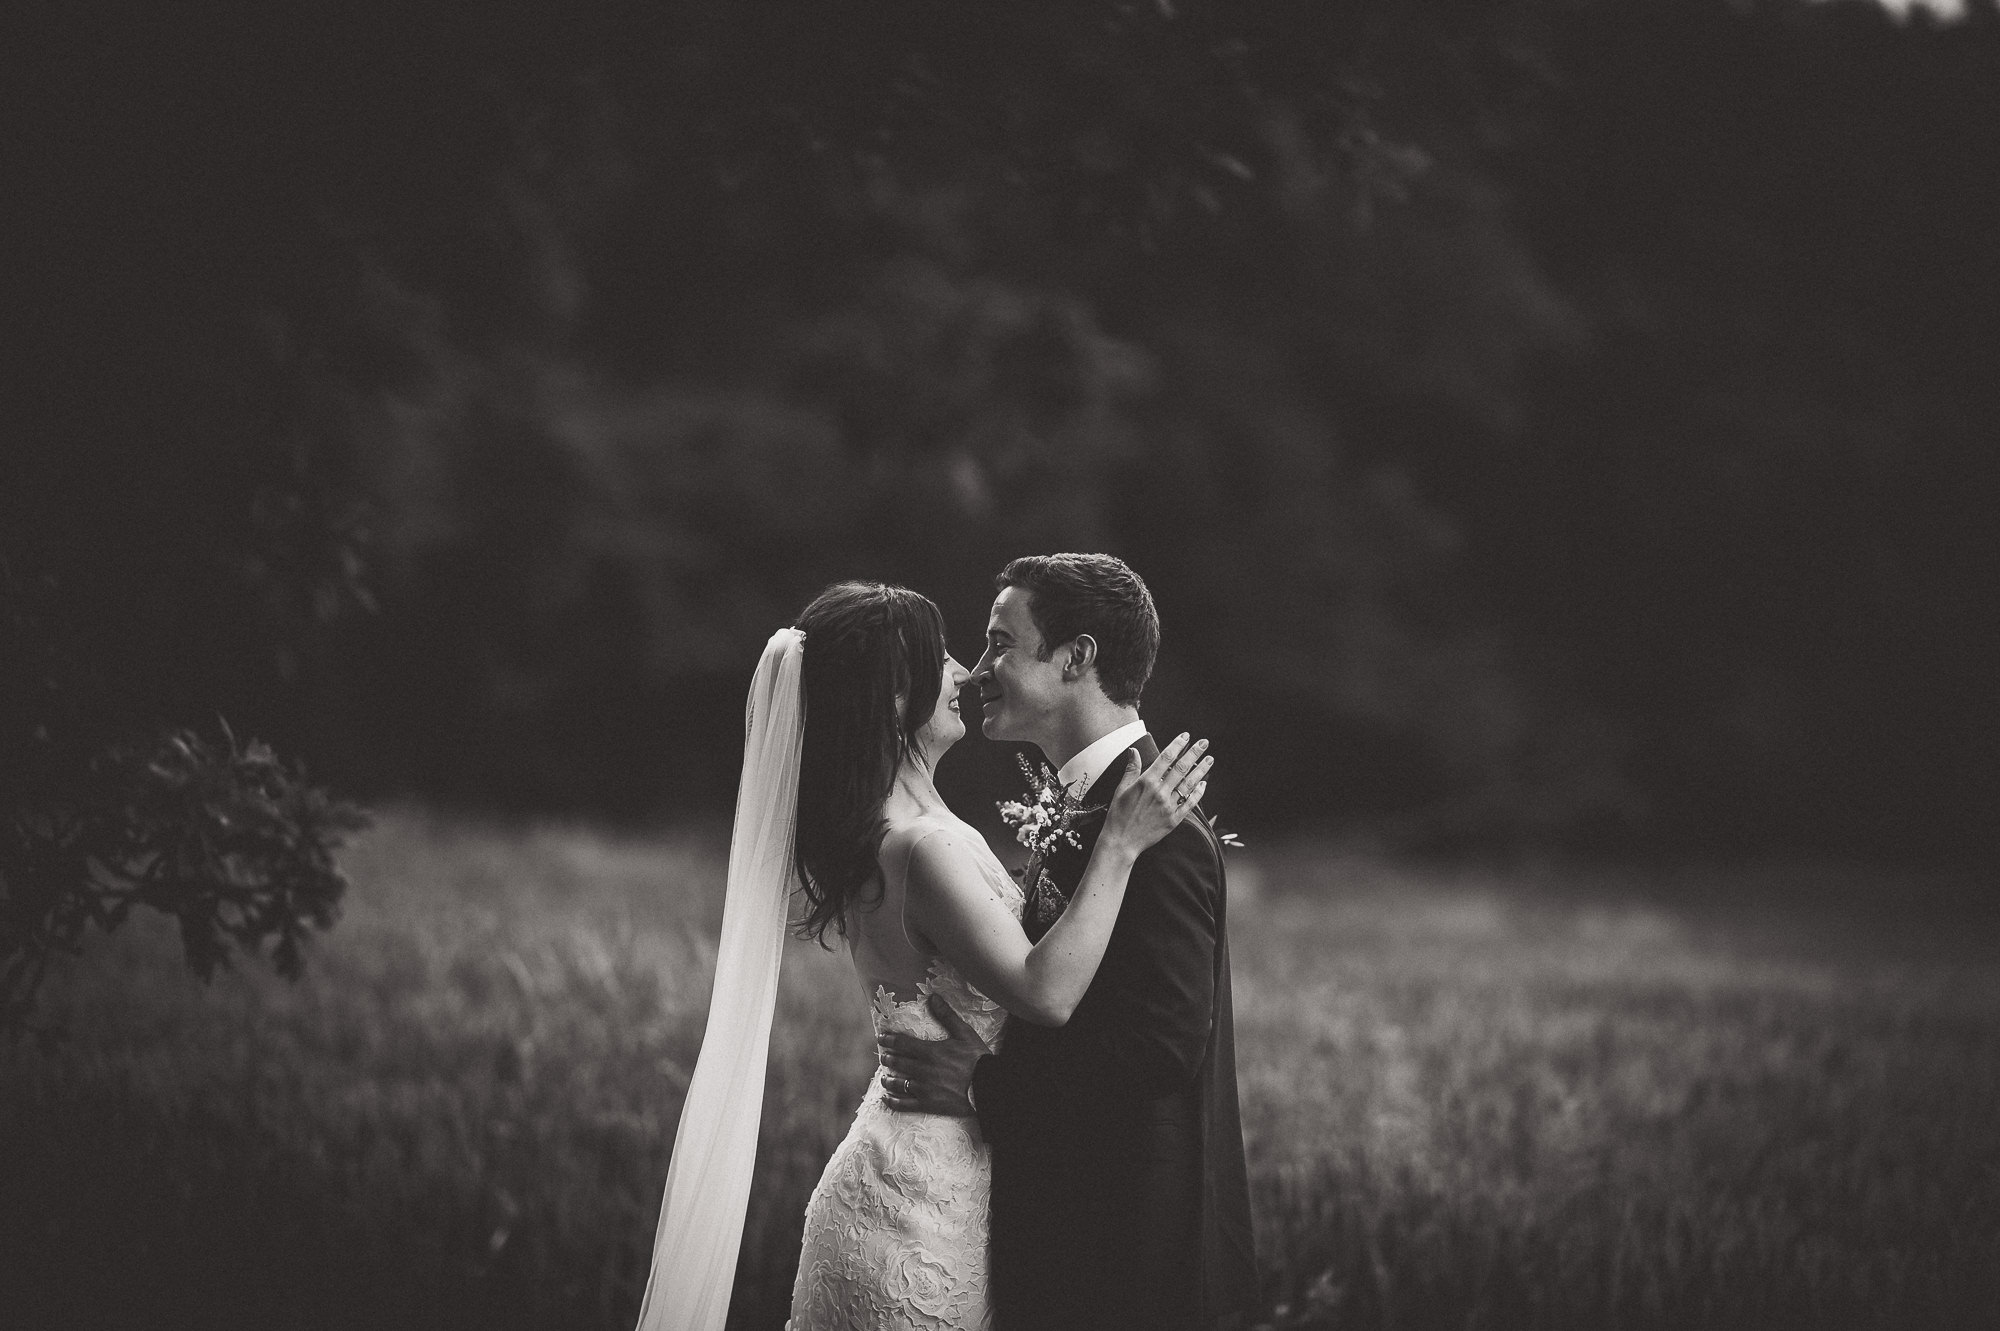 Veils & Bales Wedding Photography | Charlie & Steve SCSS 121